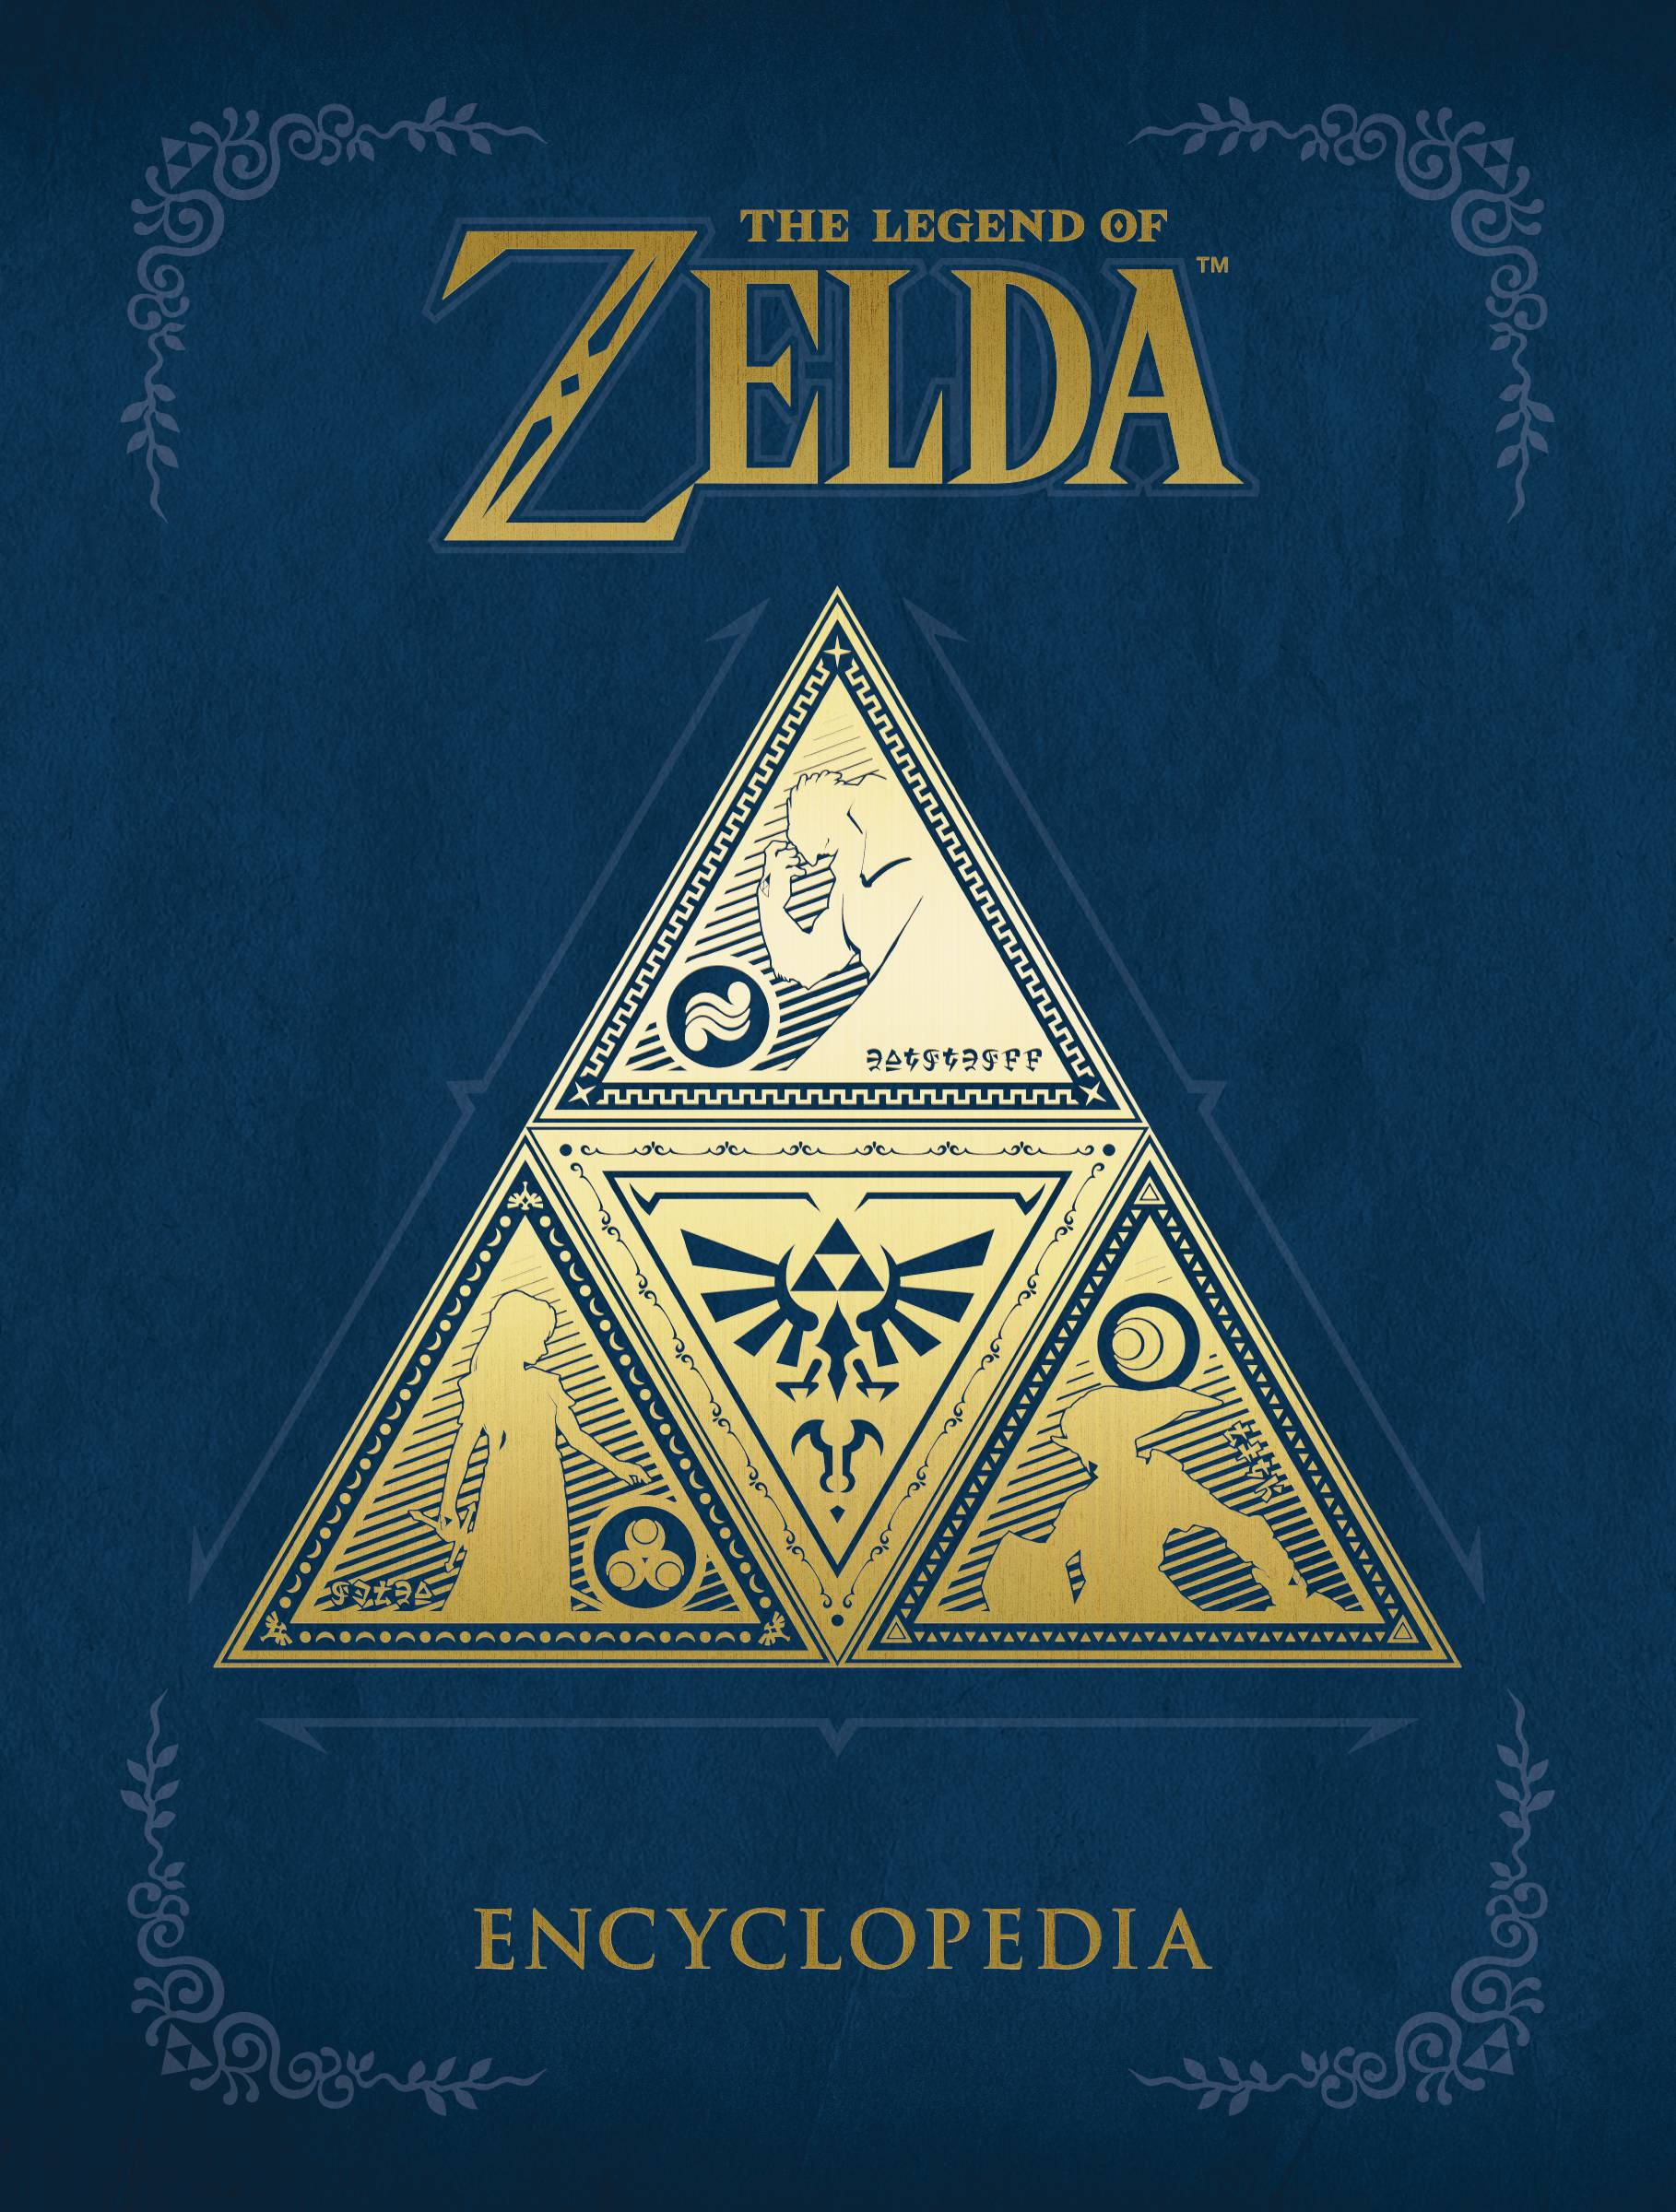 LEGEND OF ZELDA ENCYCLOPEDIA HC